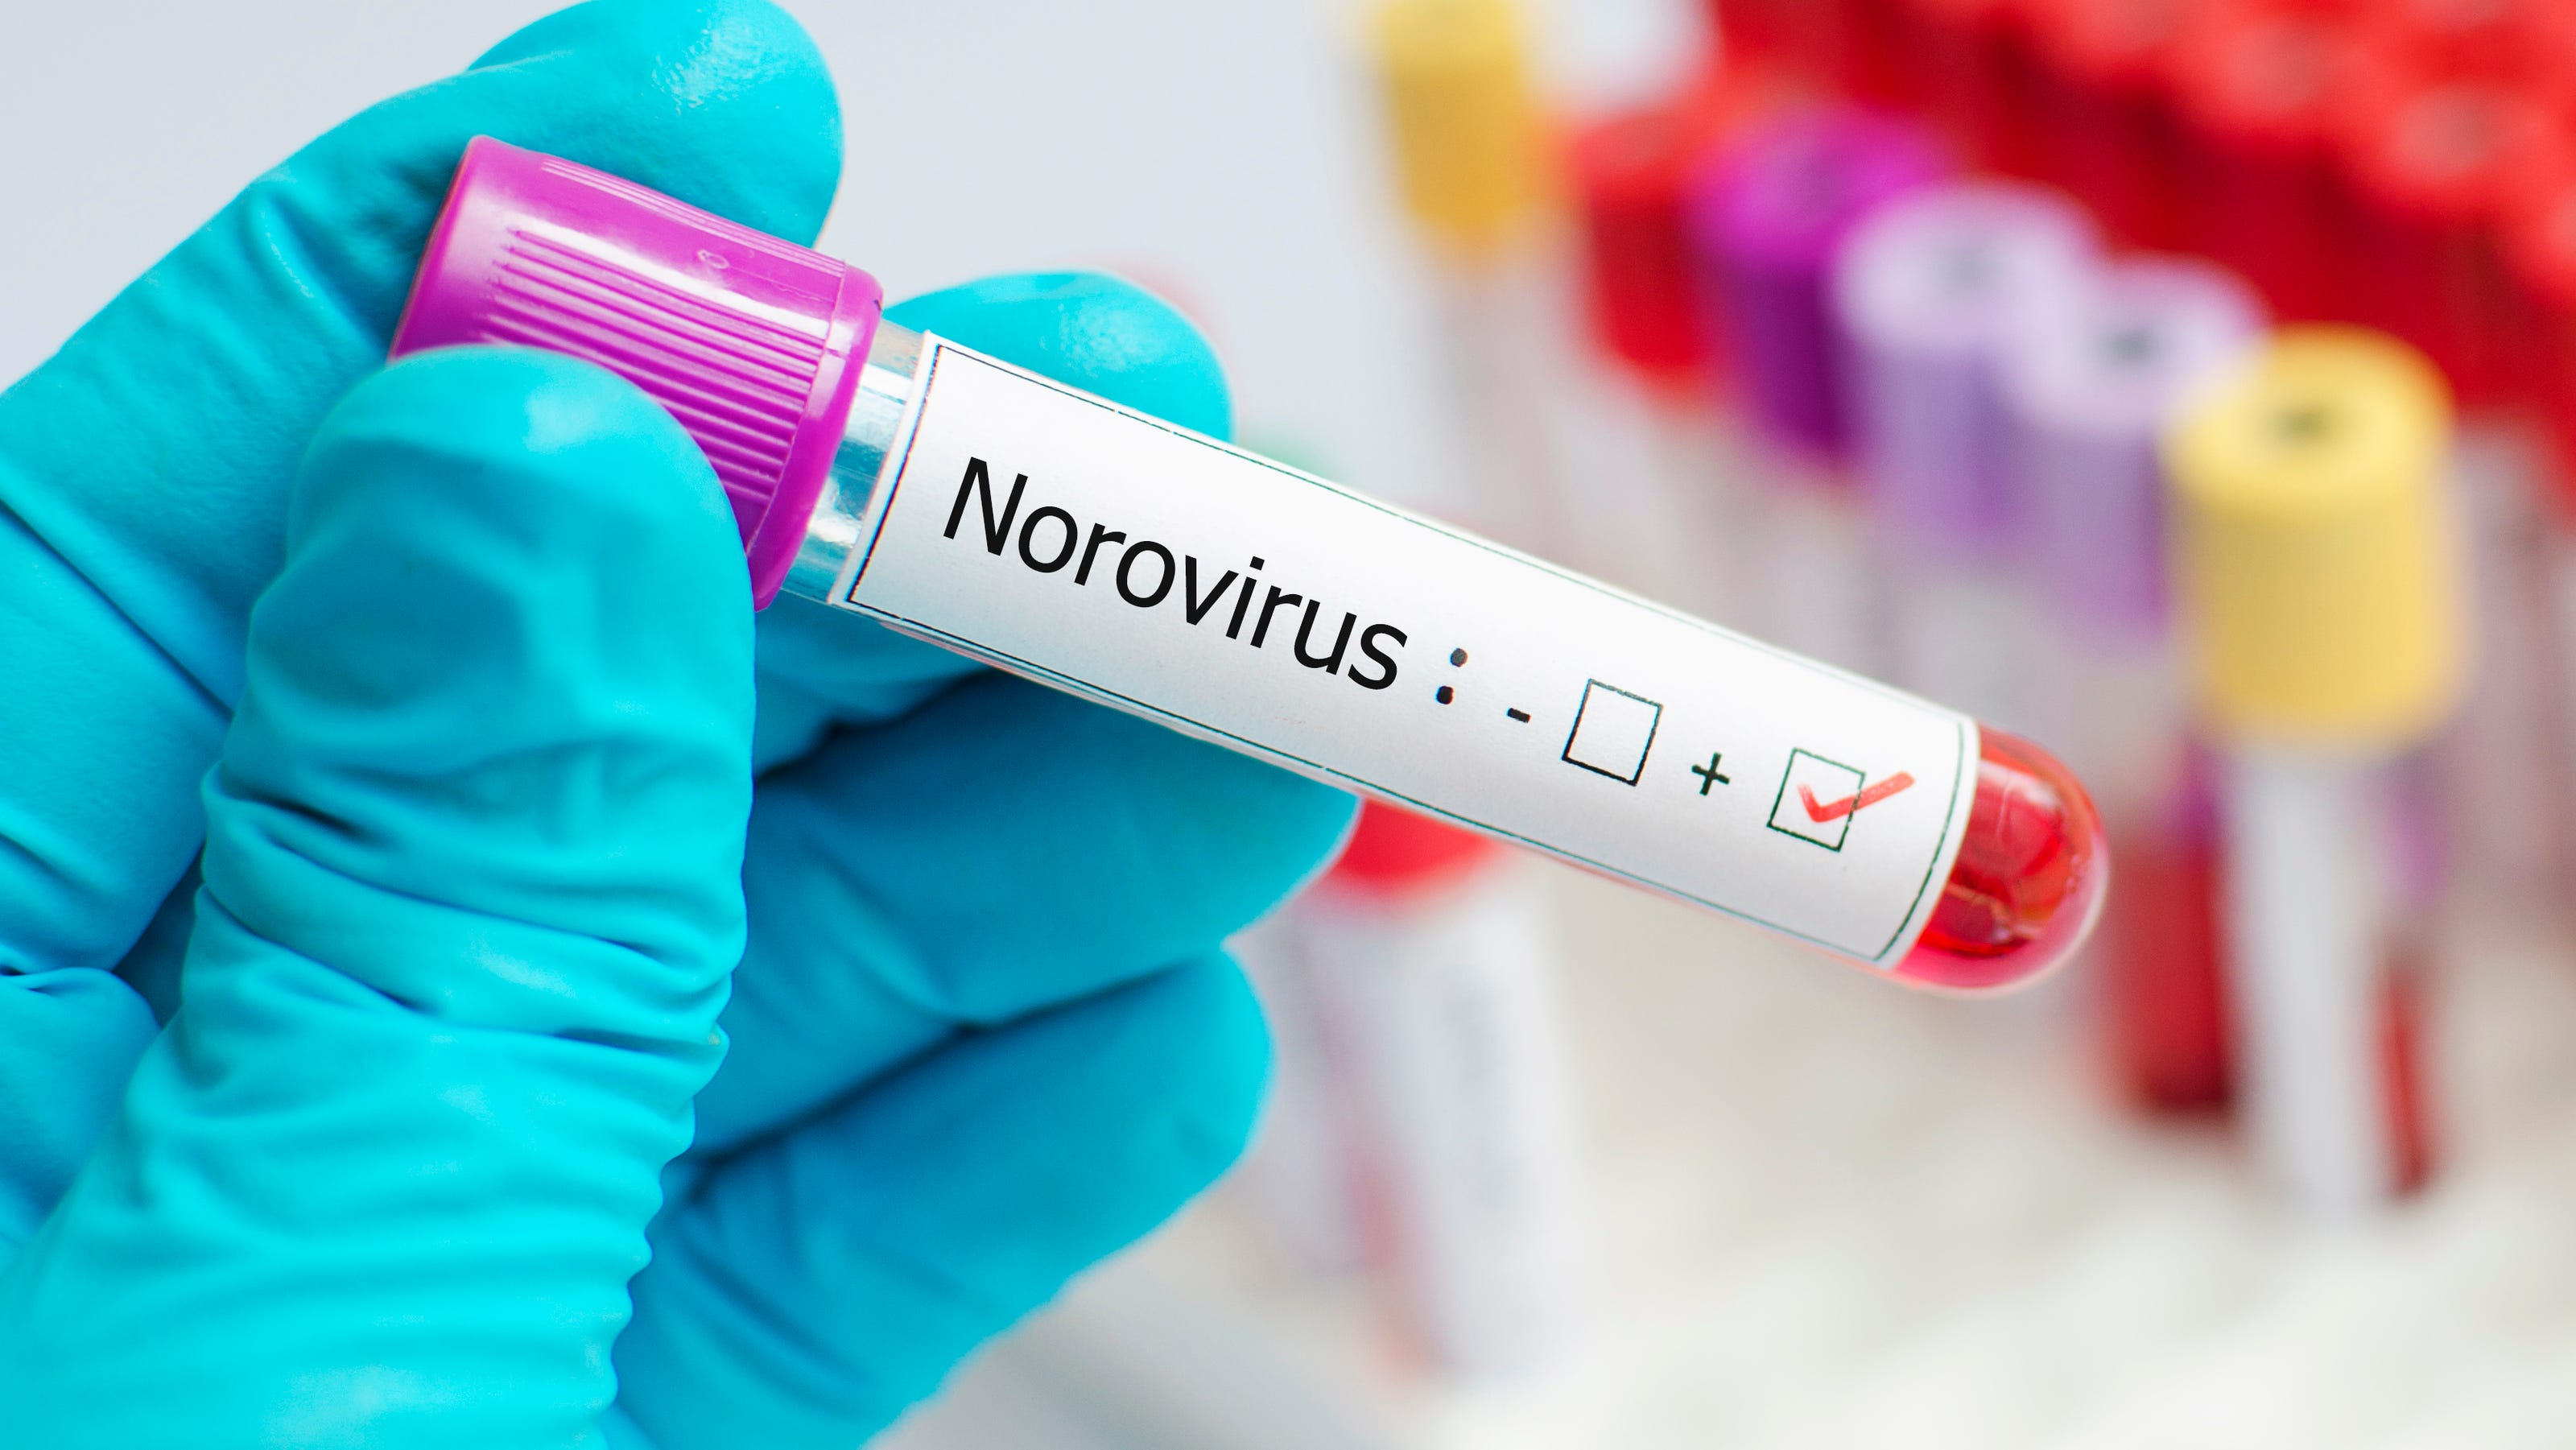 norovirus symptoms reddit